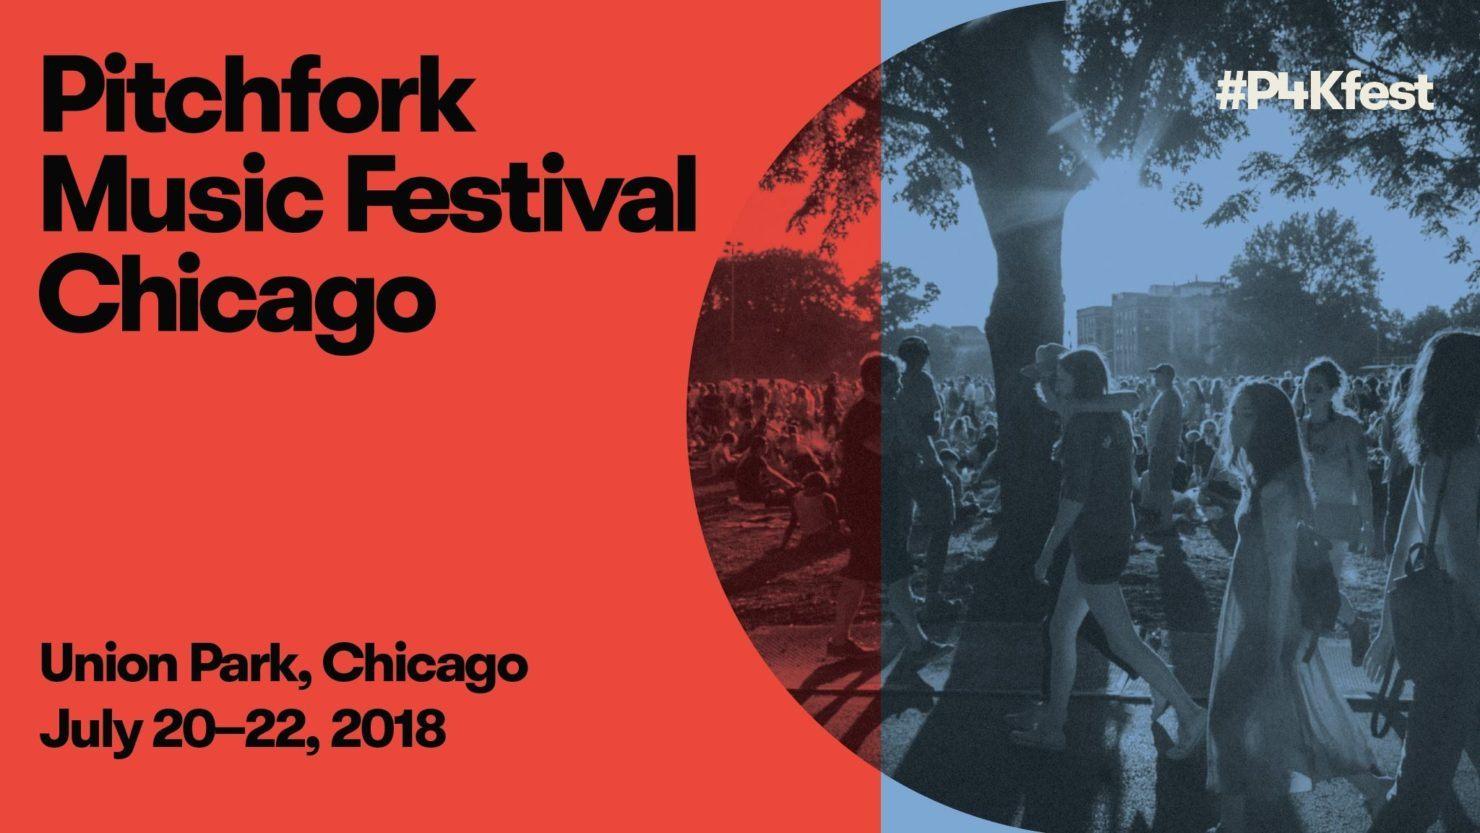 Pitchfork Music Festival 2020 Lineup.Pitchfork Music Festival Announces Full 2018 Lineup